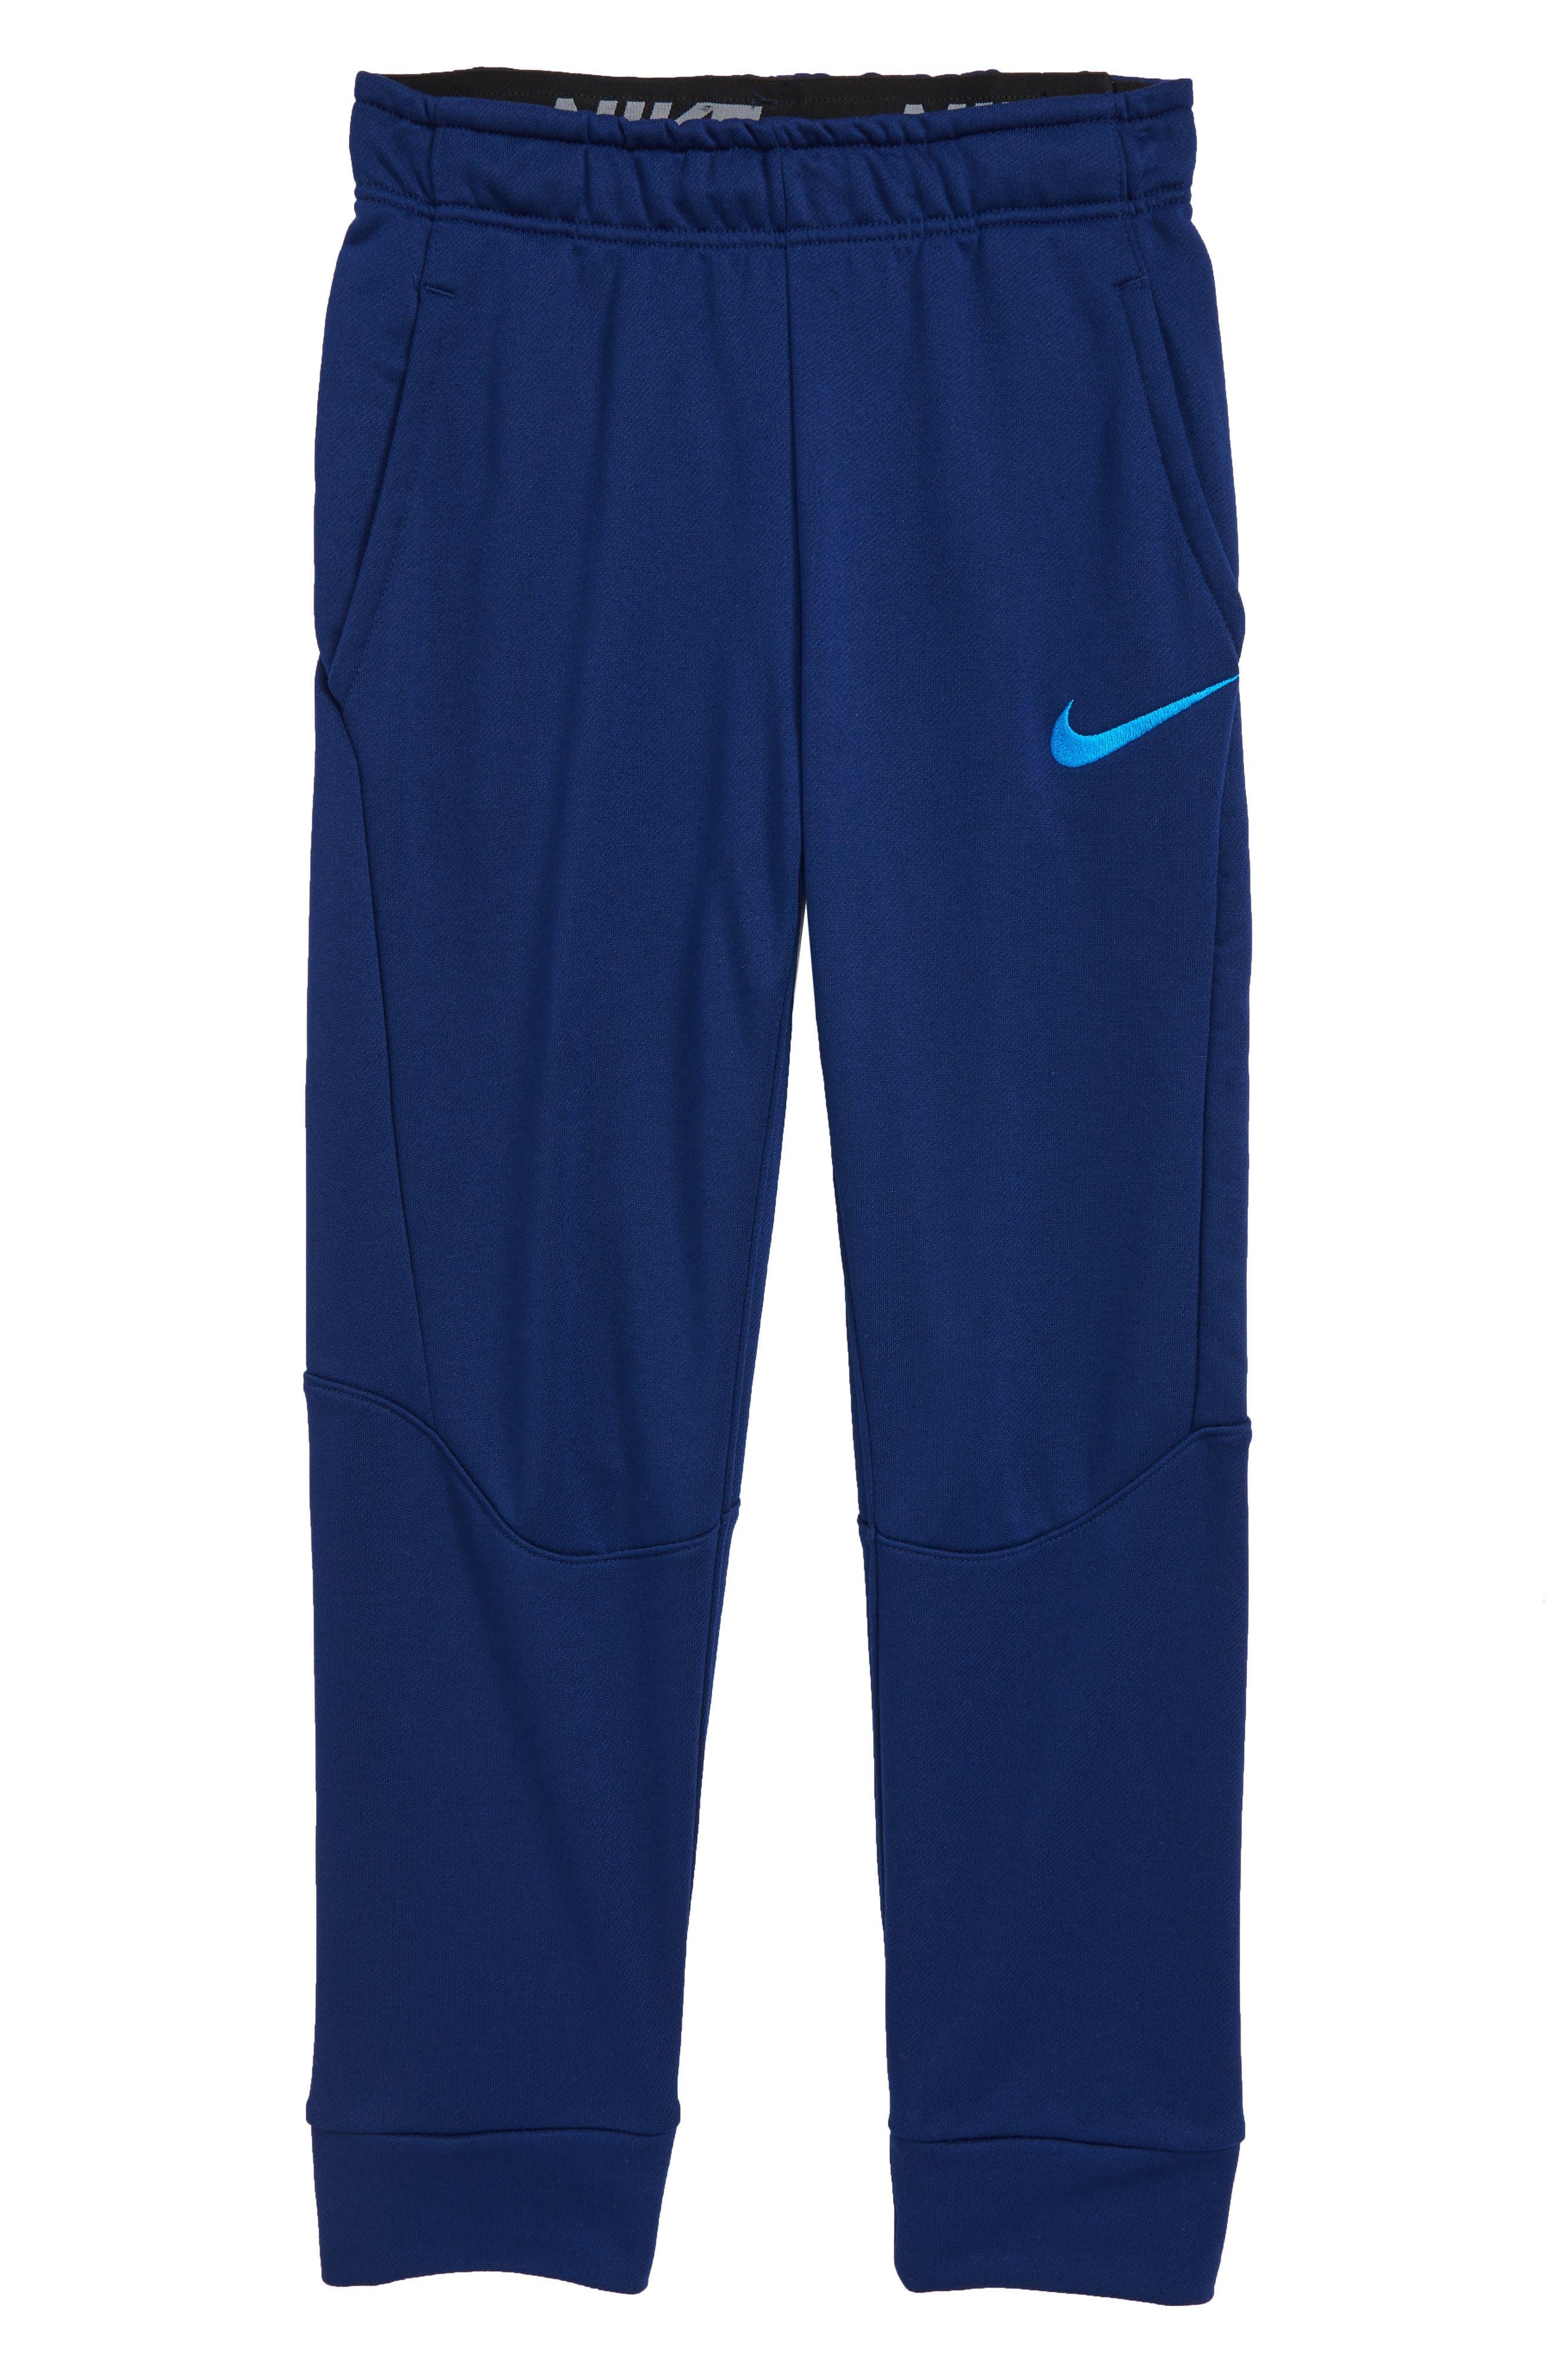 Dry Fleece Training Pants,                             Main thumbnail 1, color,                             Blue Void/ Blue Hero